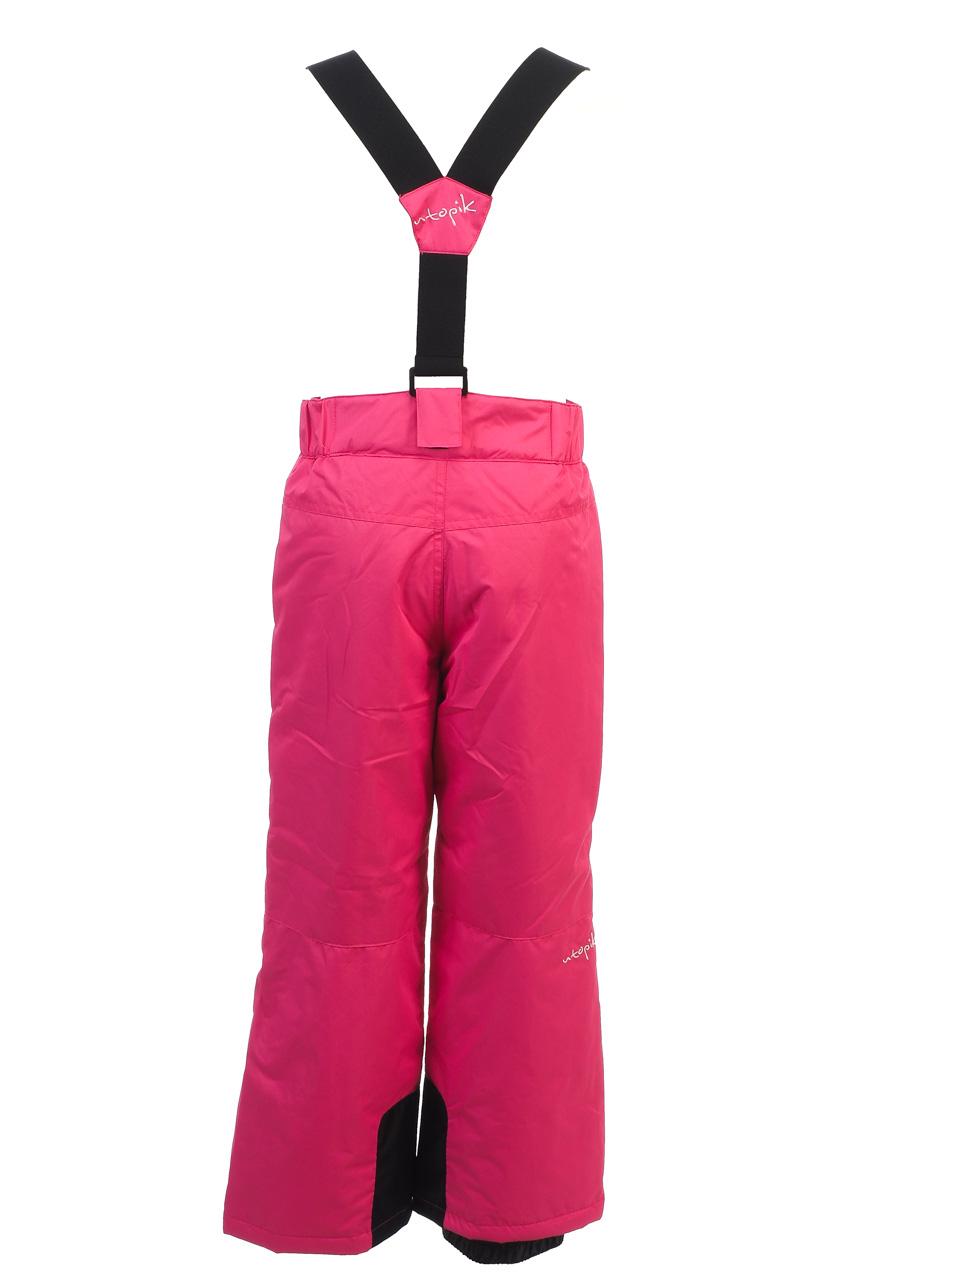 Pantalon-de-ski-surf-U-topik-Telos-rose-pant-ski-jr-Rose-52175-Neuf